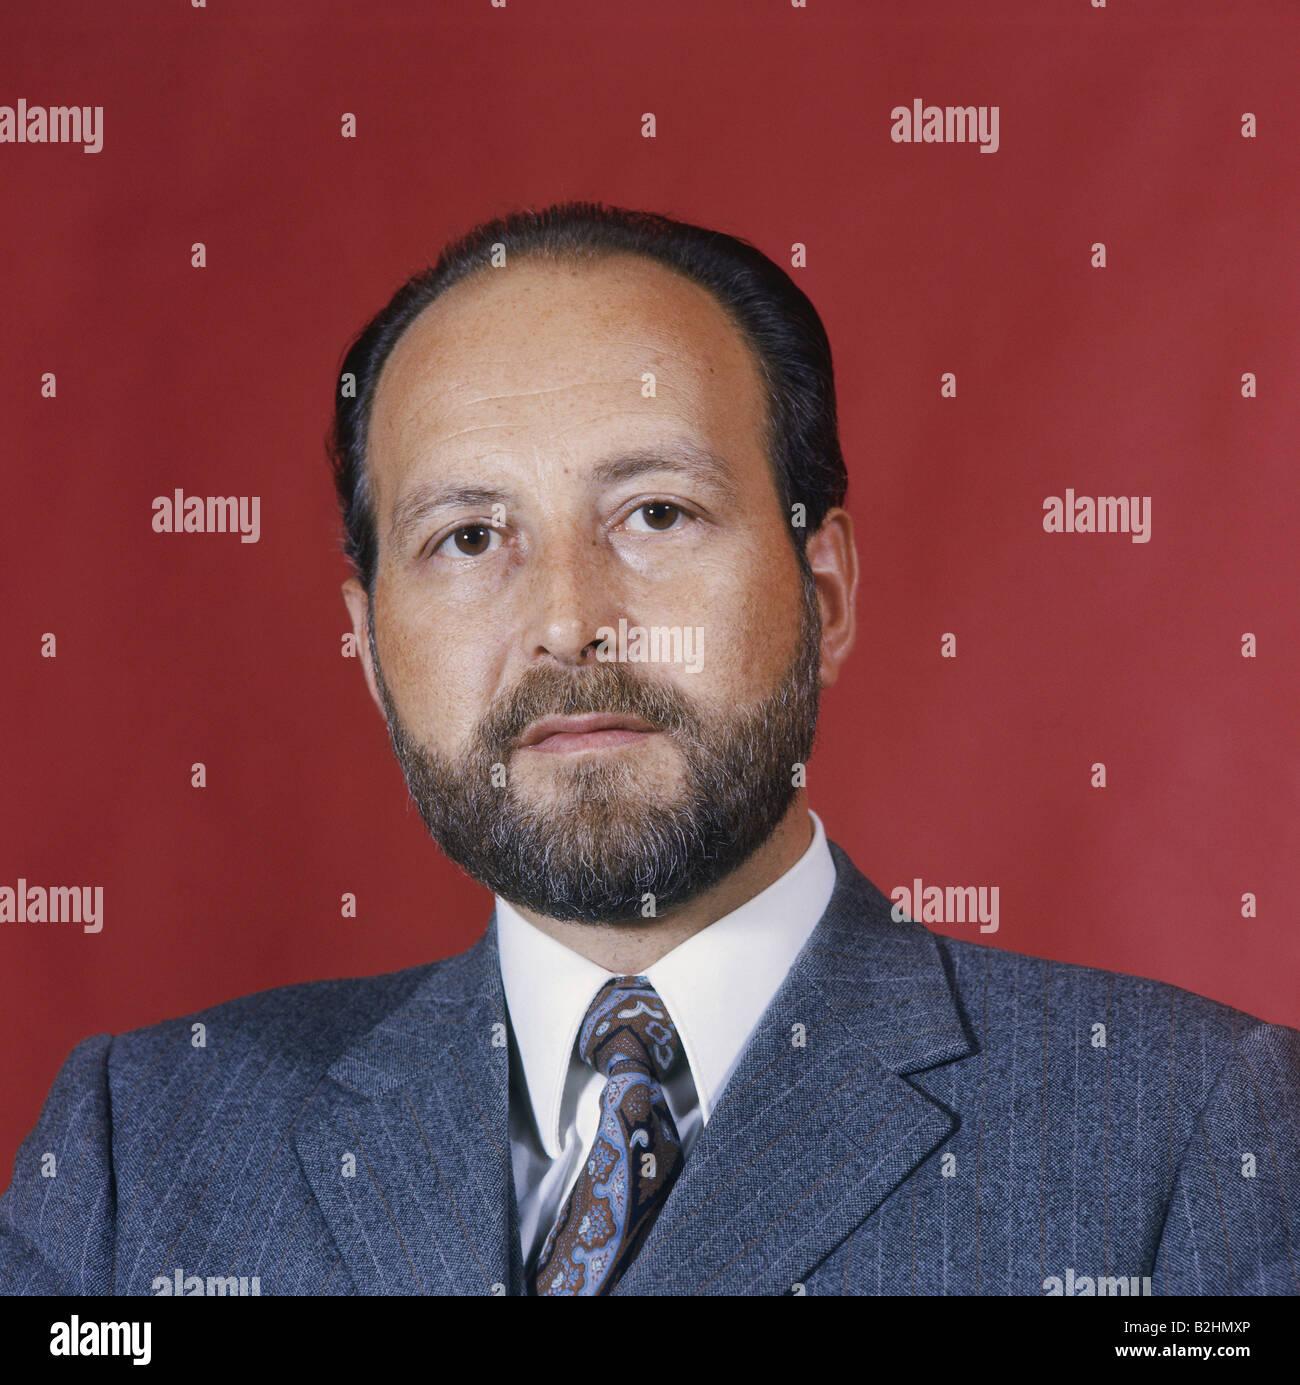 Engelhard, Hans Arnold, 16.9.1934 - 11.3.2008, German politician (FDP), portrait, 1972, Additional-Rights-Clearances - Stock Image